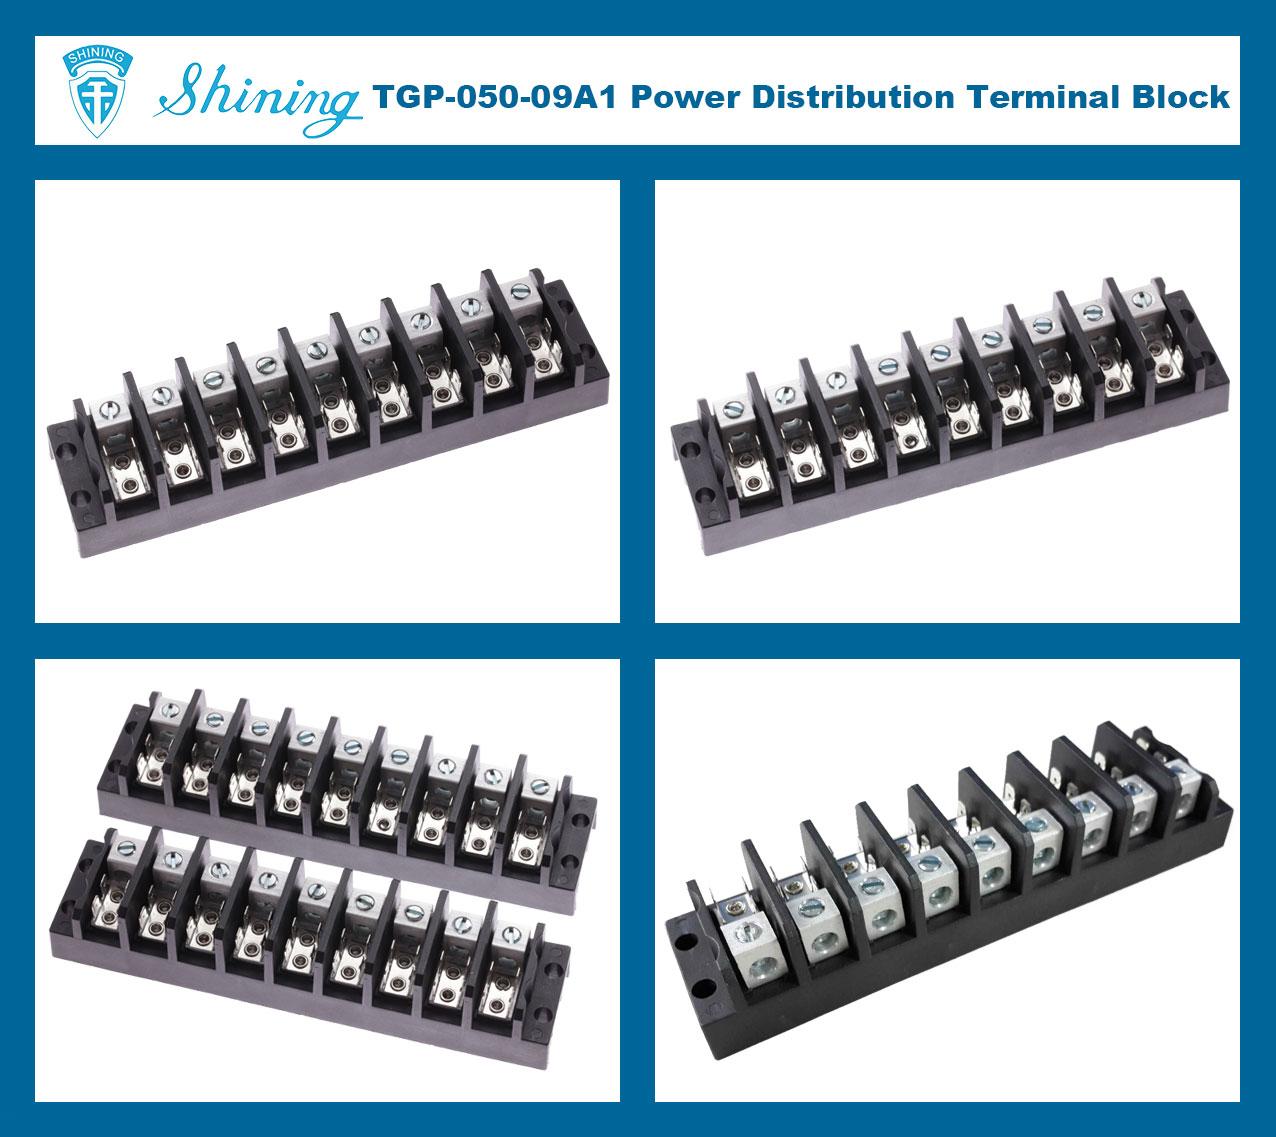 Taiwan Electrical Power Quick Connect Terminal Block TGP-050